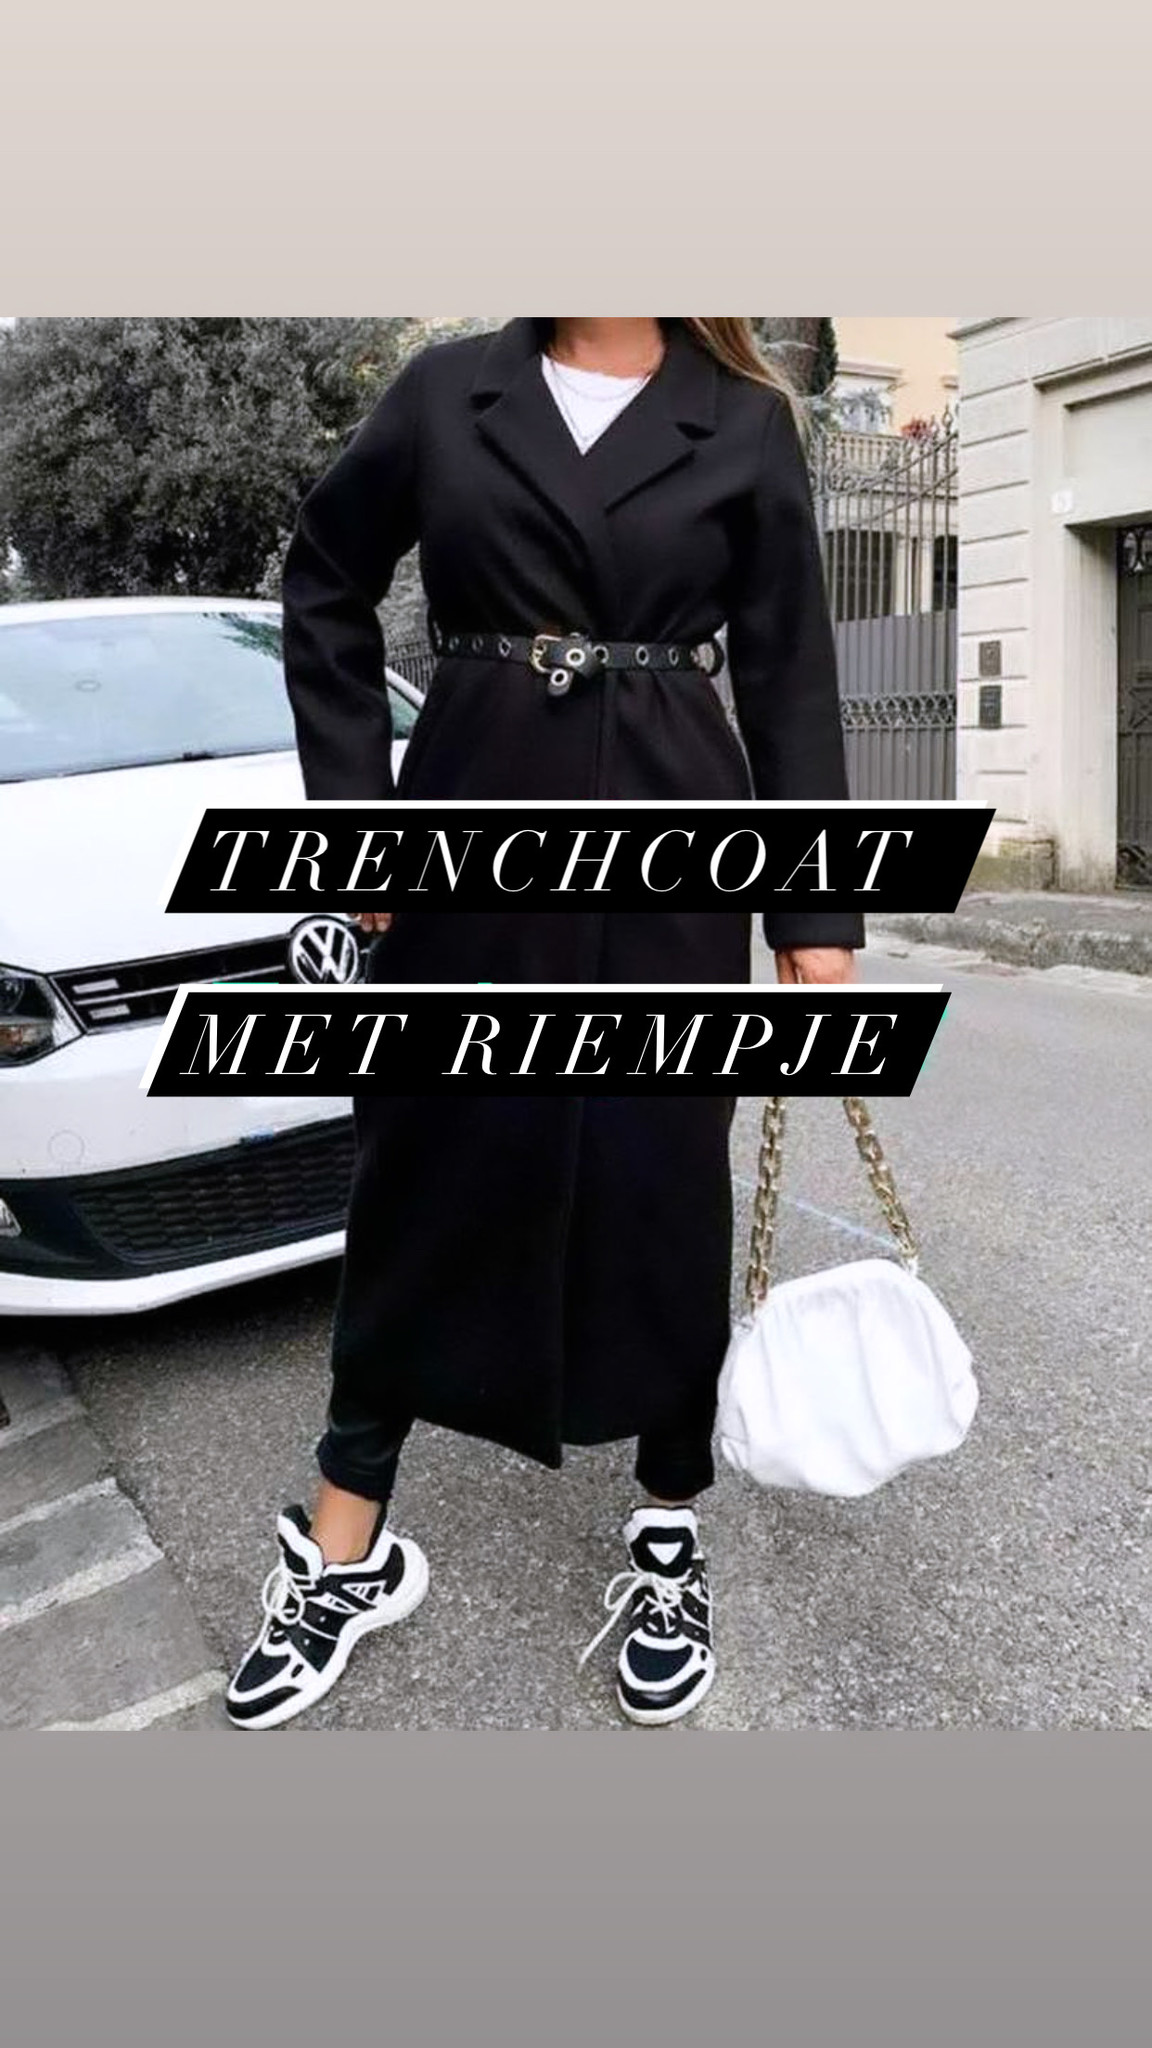 TRENCHCOAT BELT BLACK